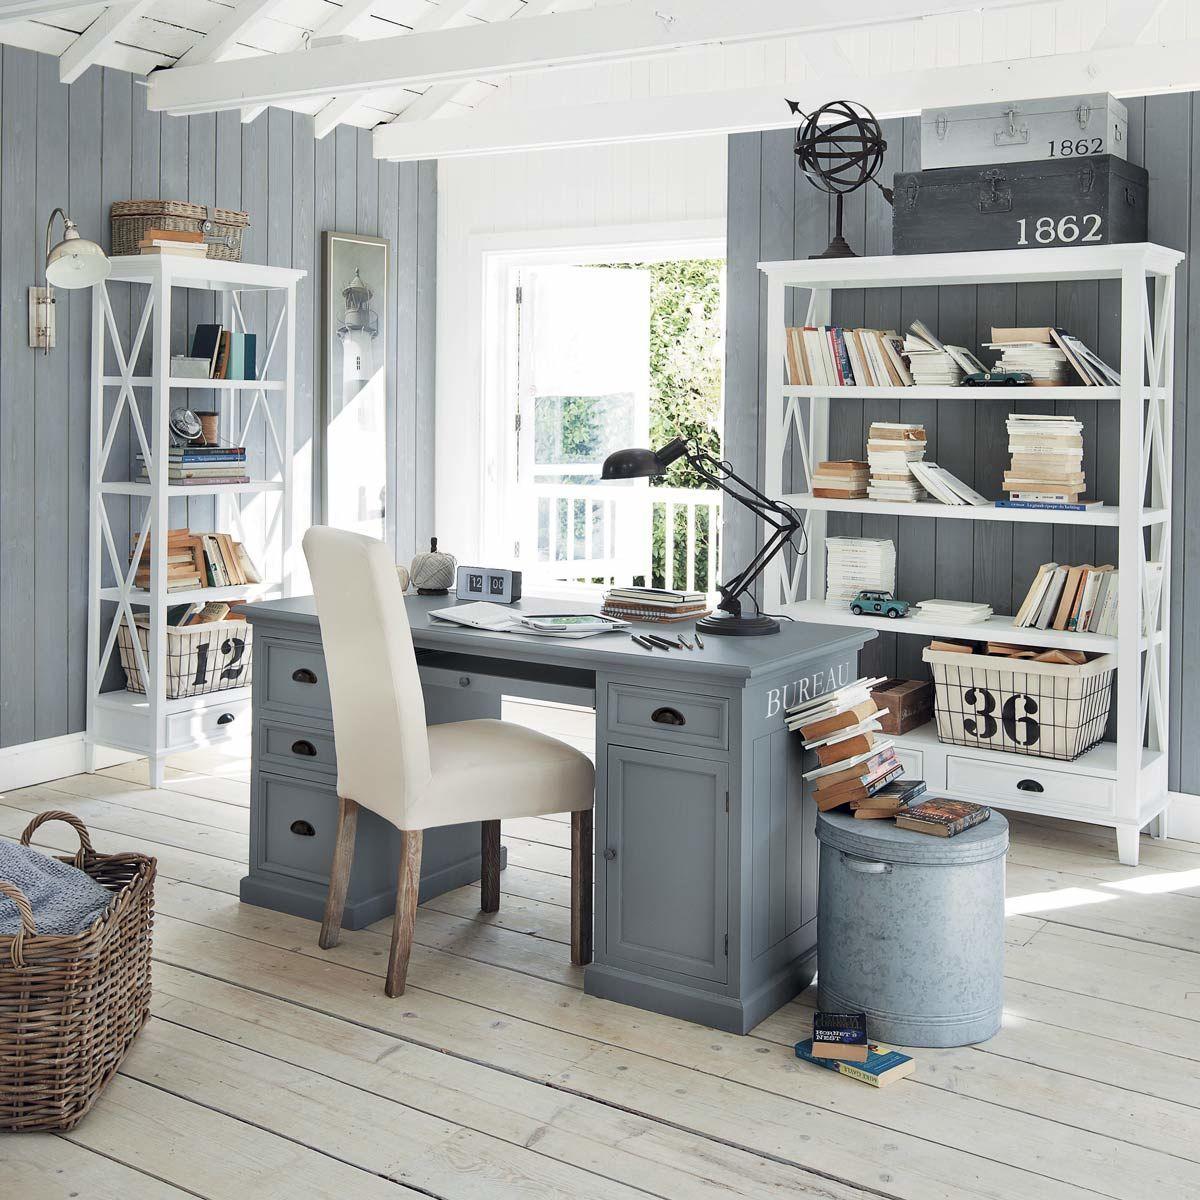 Wooden desk in grey W 150cm in 2019 | ξενωνας | Wooden desk, Home ...